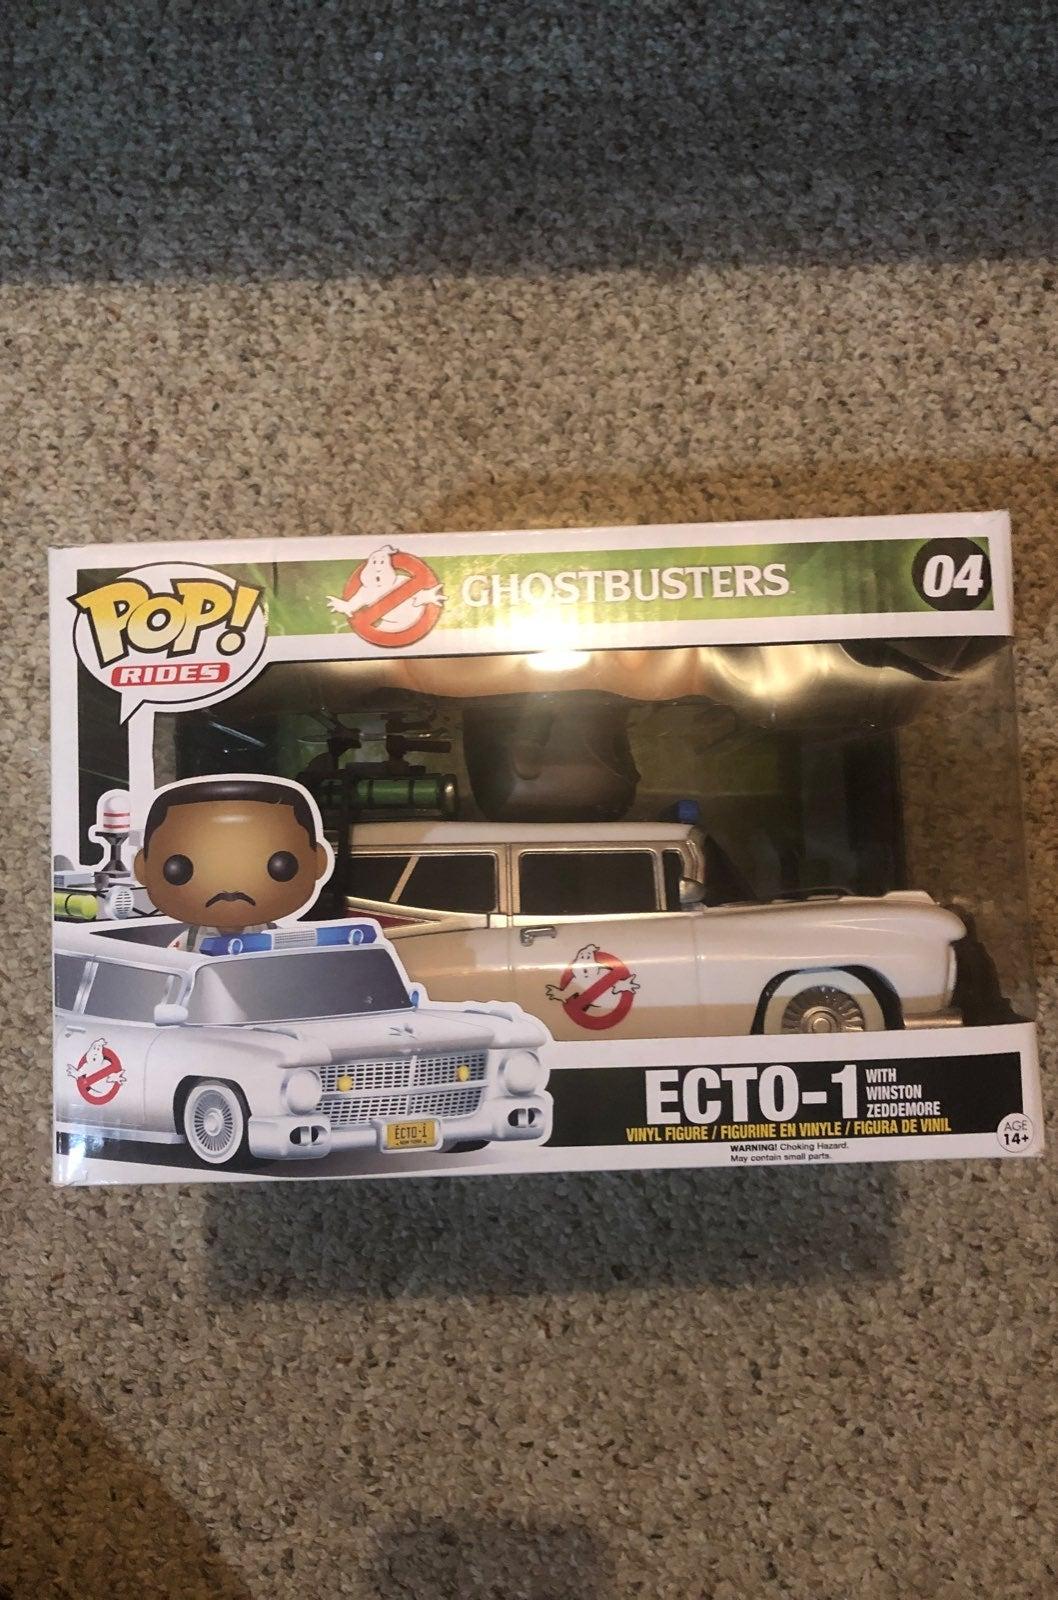 Funko Pop Ghostbusters Ecto-1 car